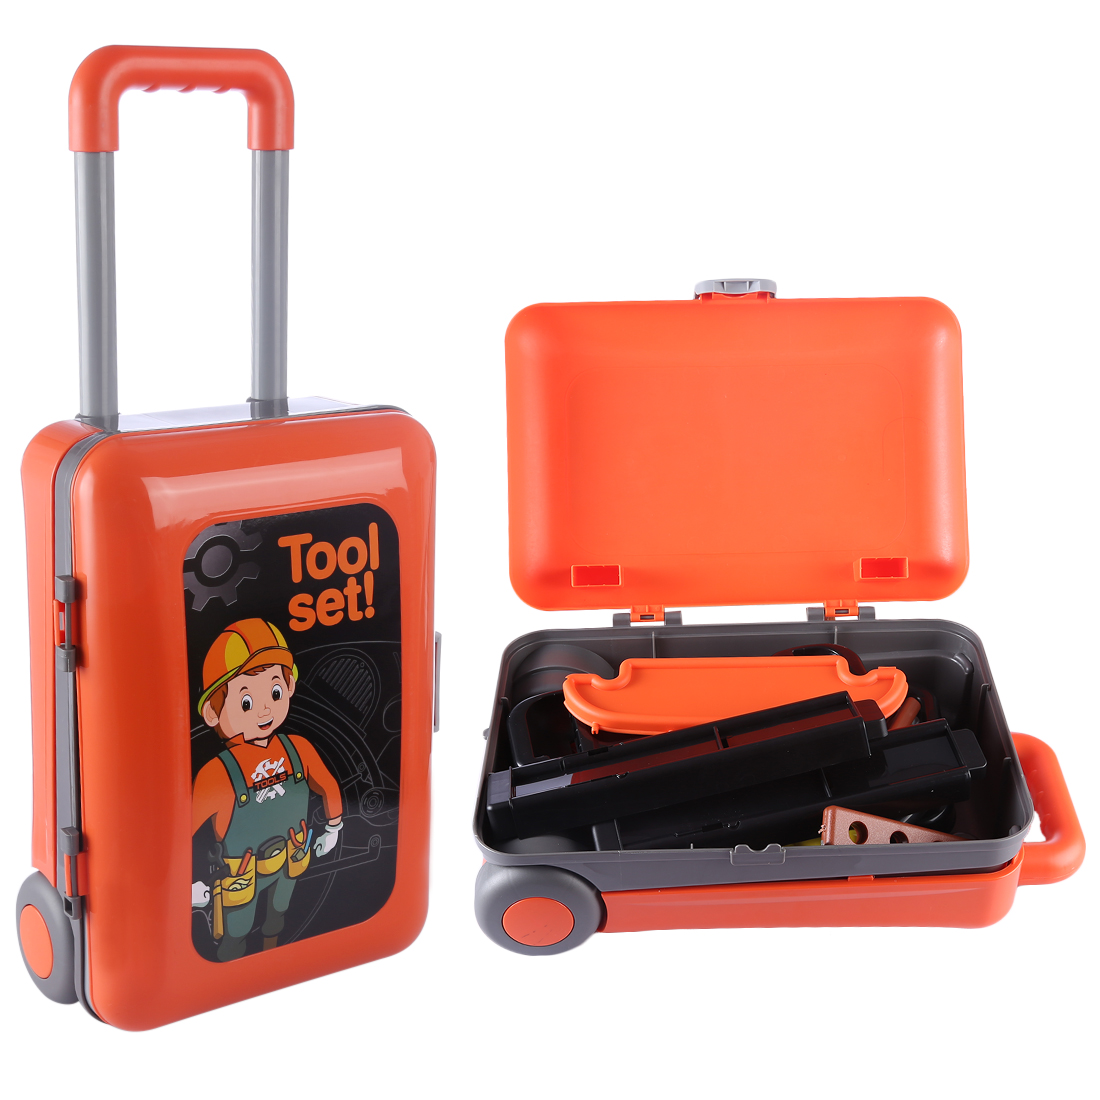 цены на Surwish Children Repair Tool Toys Set ABS Workshop Playset Kids Parents Interactive Educational Gift Toy-Orange  в интернет-магазинах